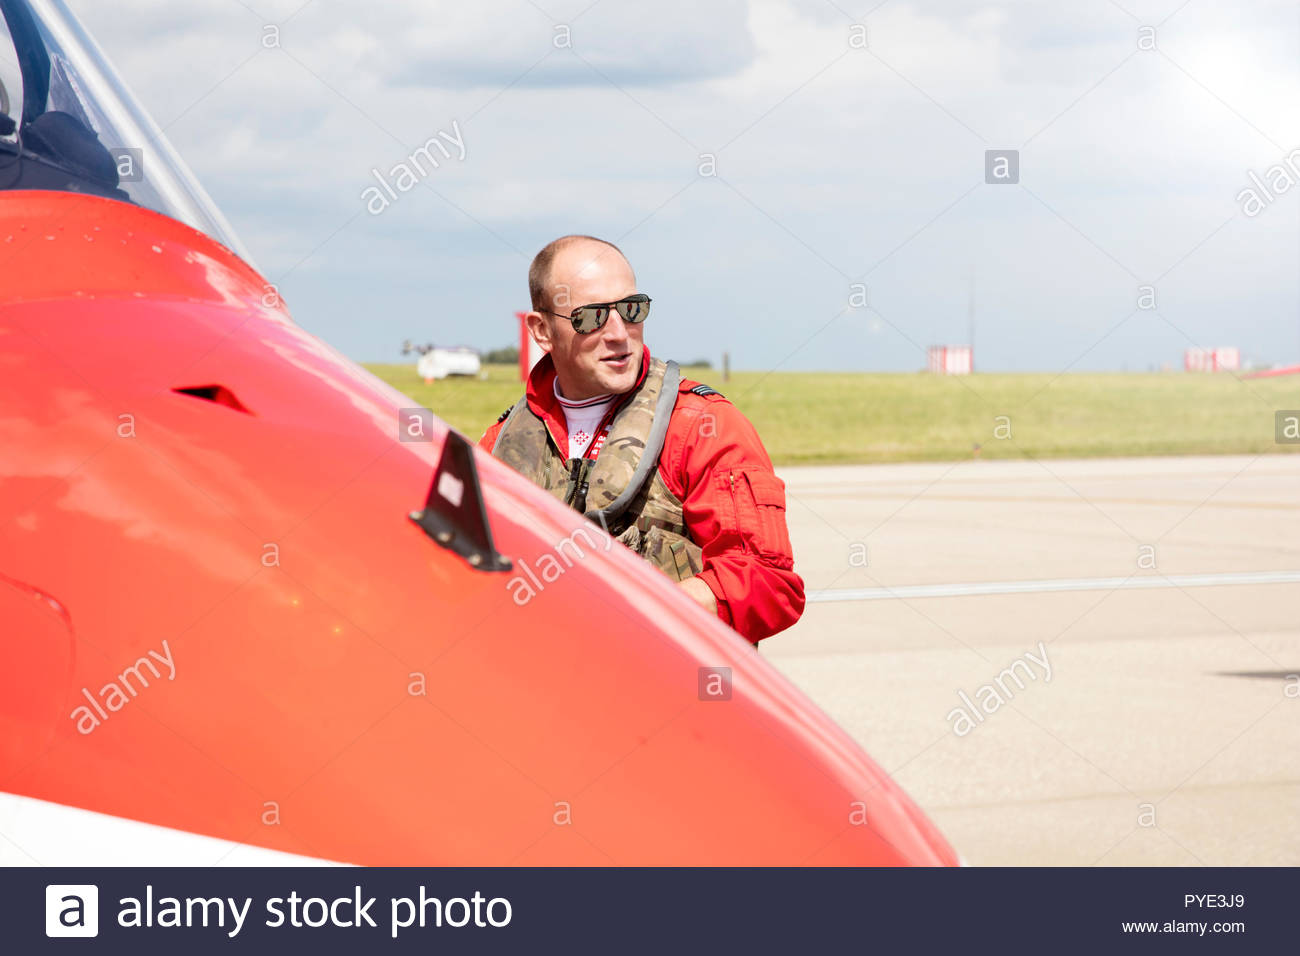 Red Arrows pilot wearing sunglasses by airplane on RAF Scrampton, UK - Stock Image